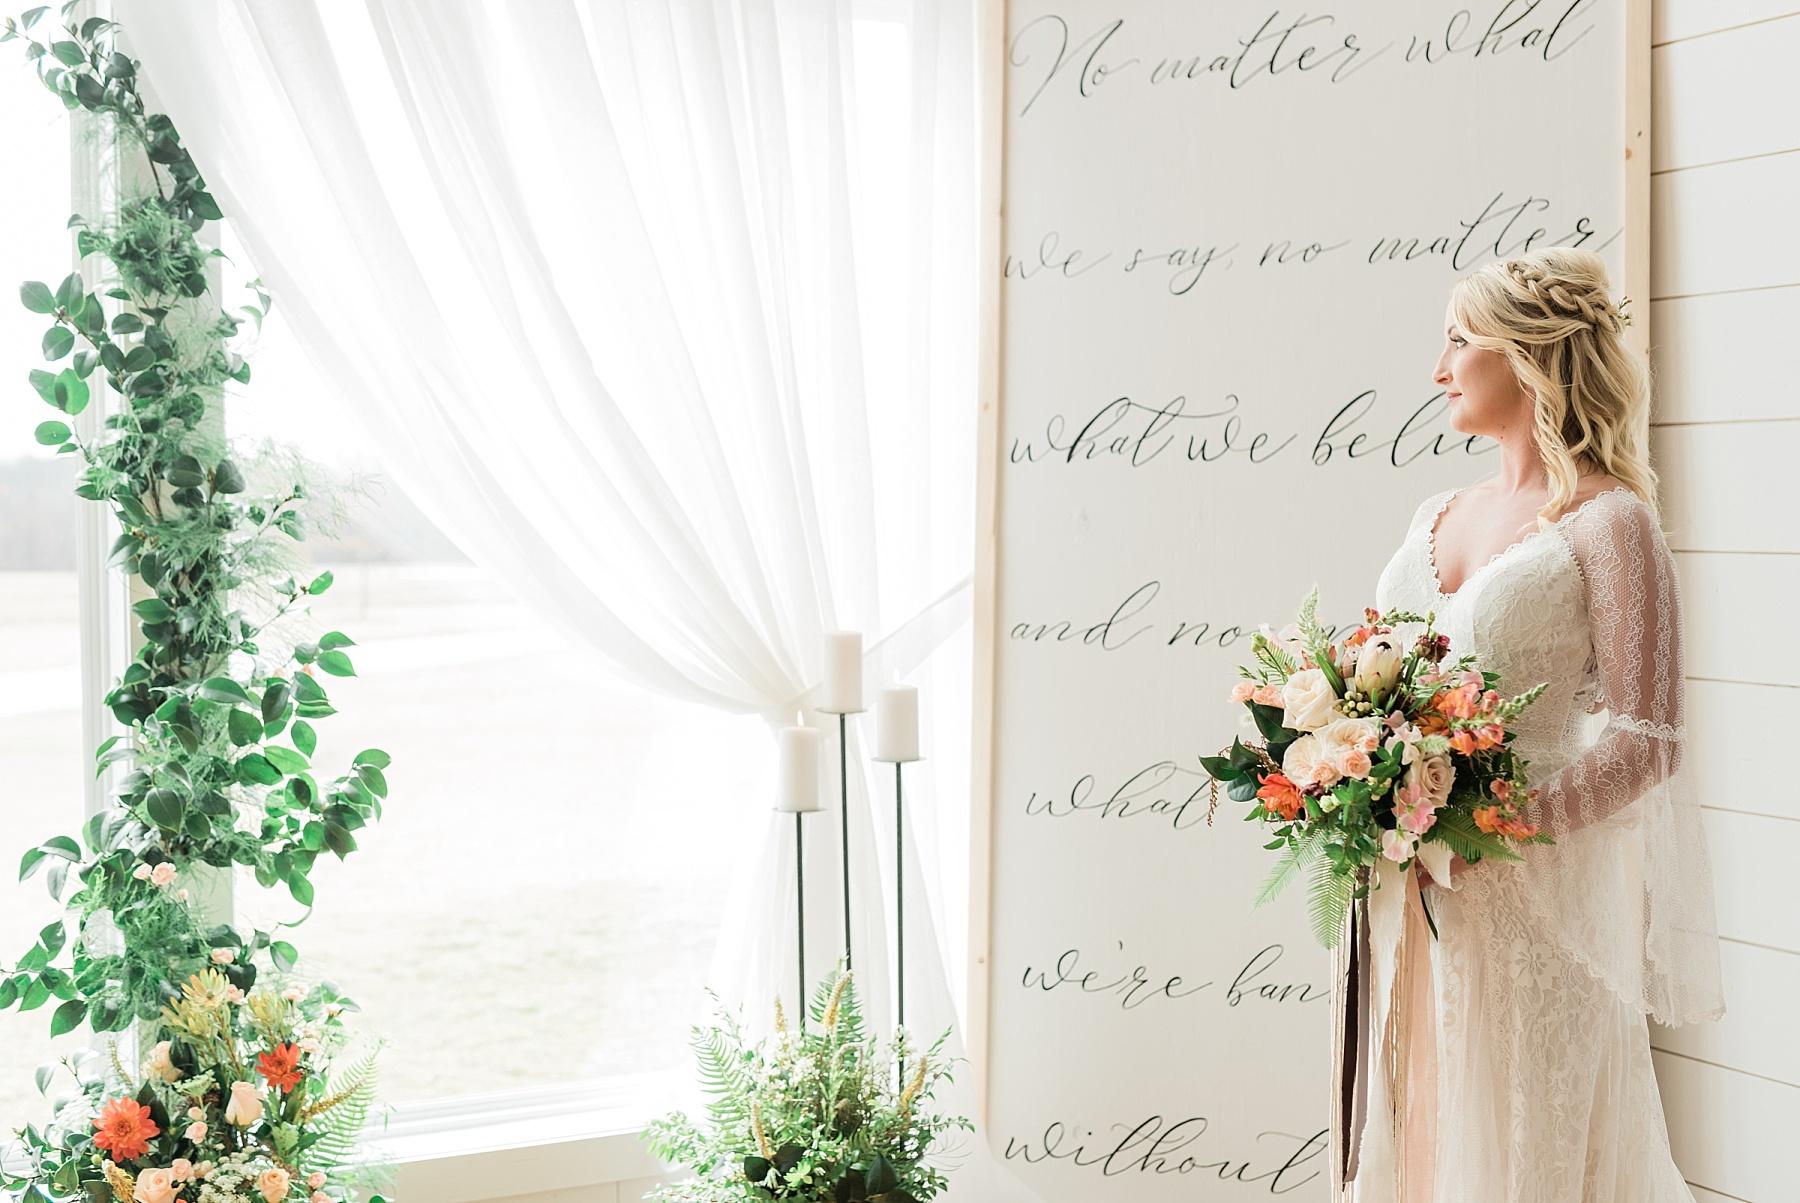 Eclectic Scandinavian Winter Wedding in All White Venue Emerson Fields by Kelsi Kliethermes Photography Best Missouri and Maui Wedding Photographer_0027.jpg